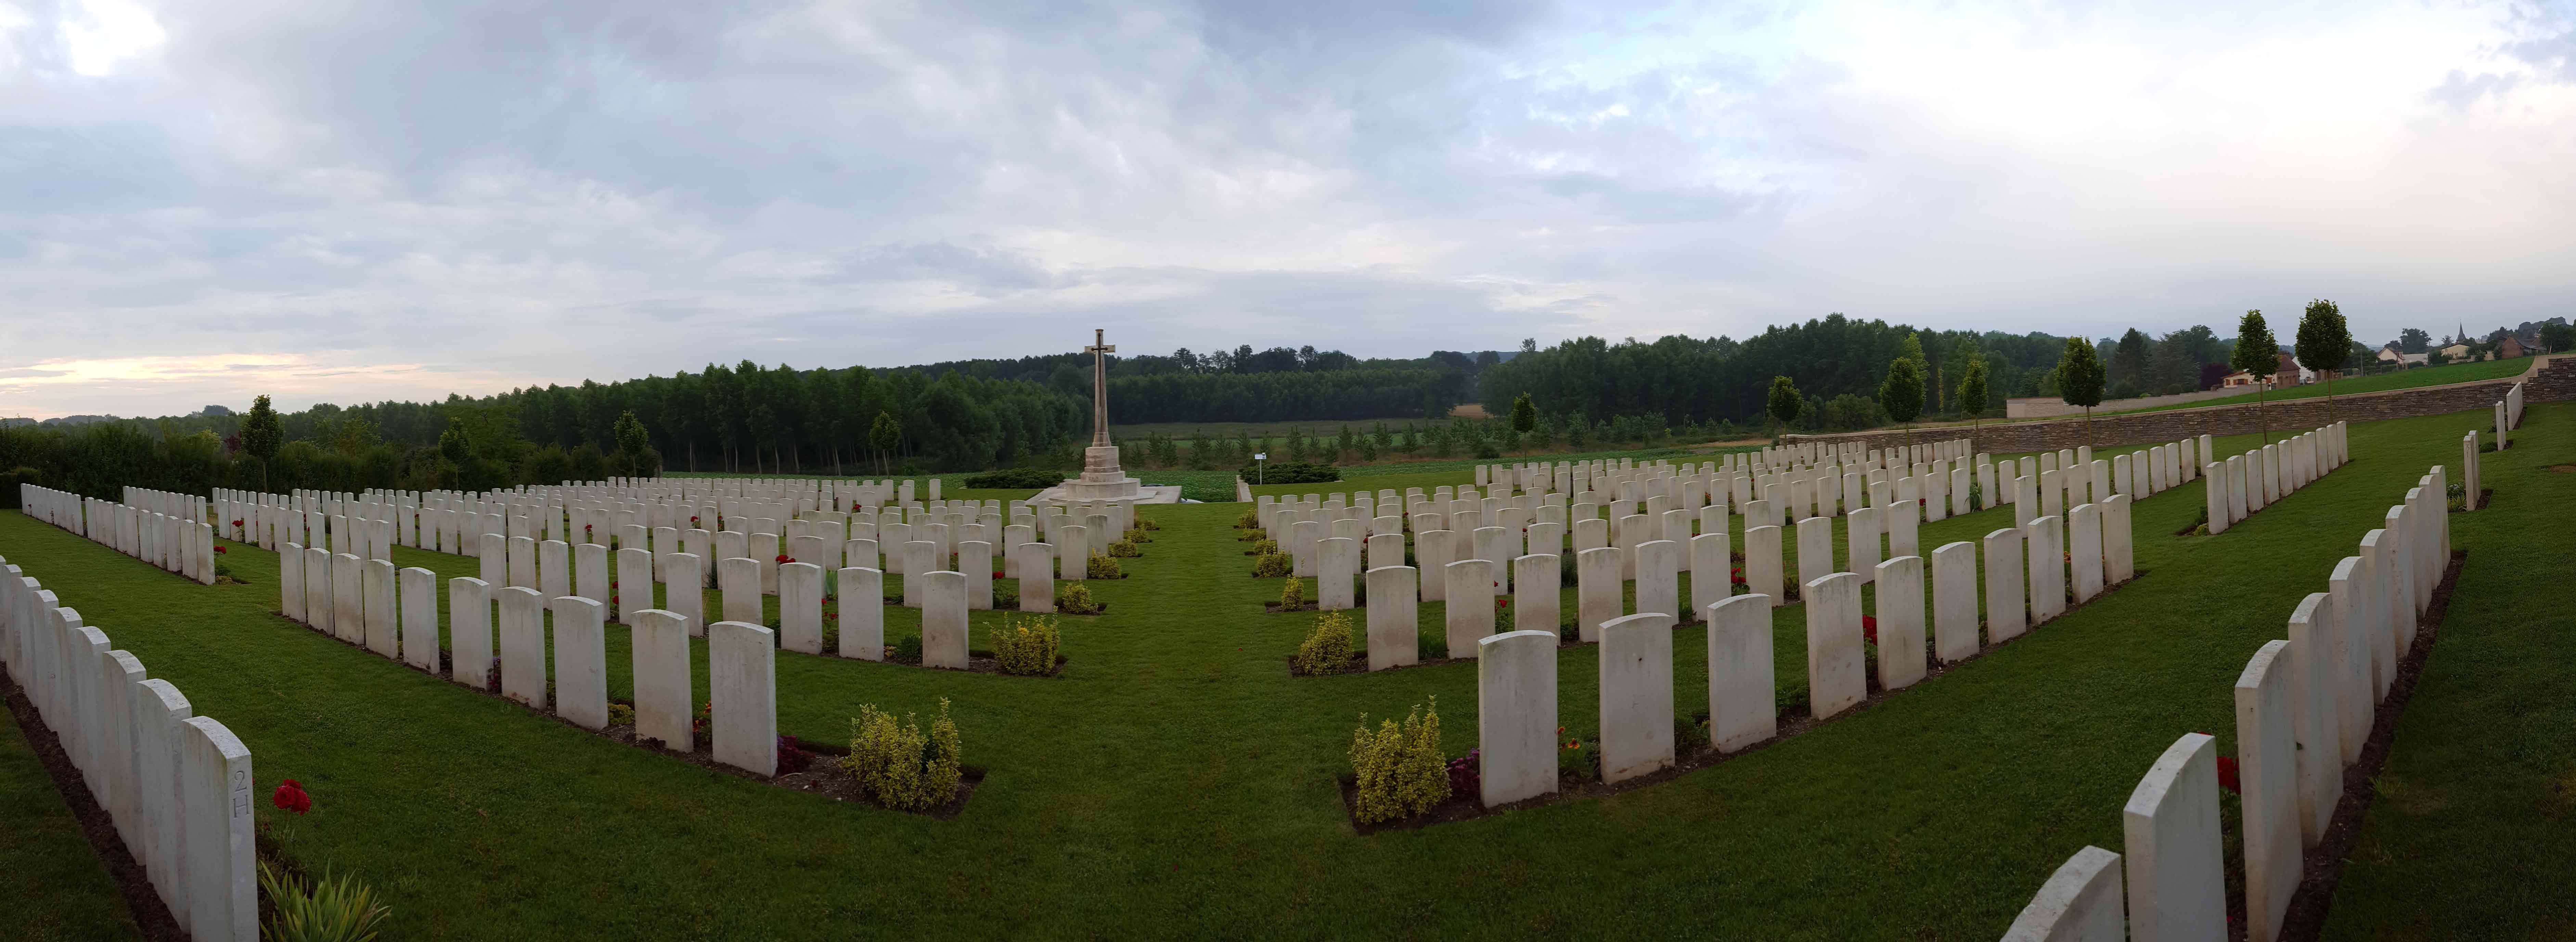 Cemetery-G-Ramsell